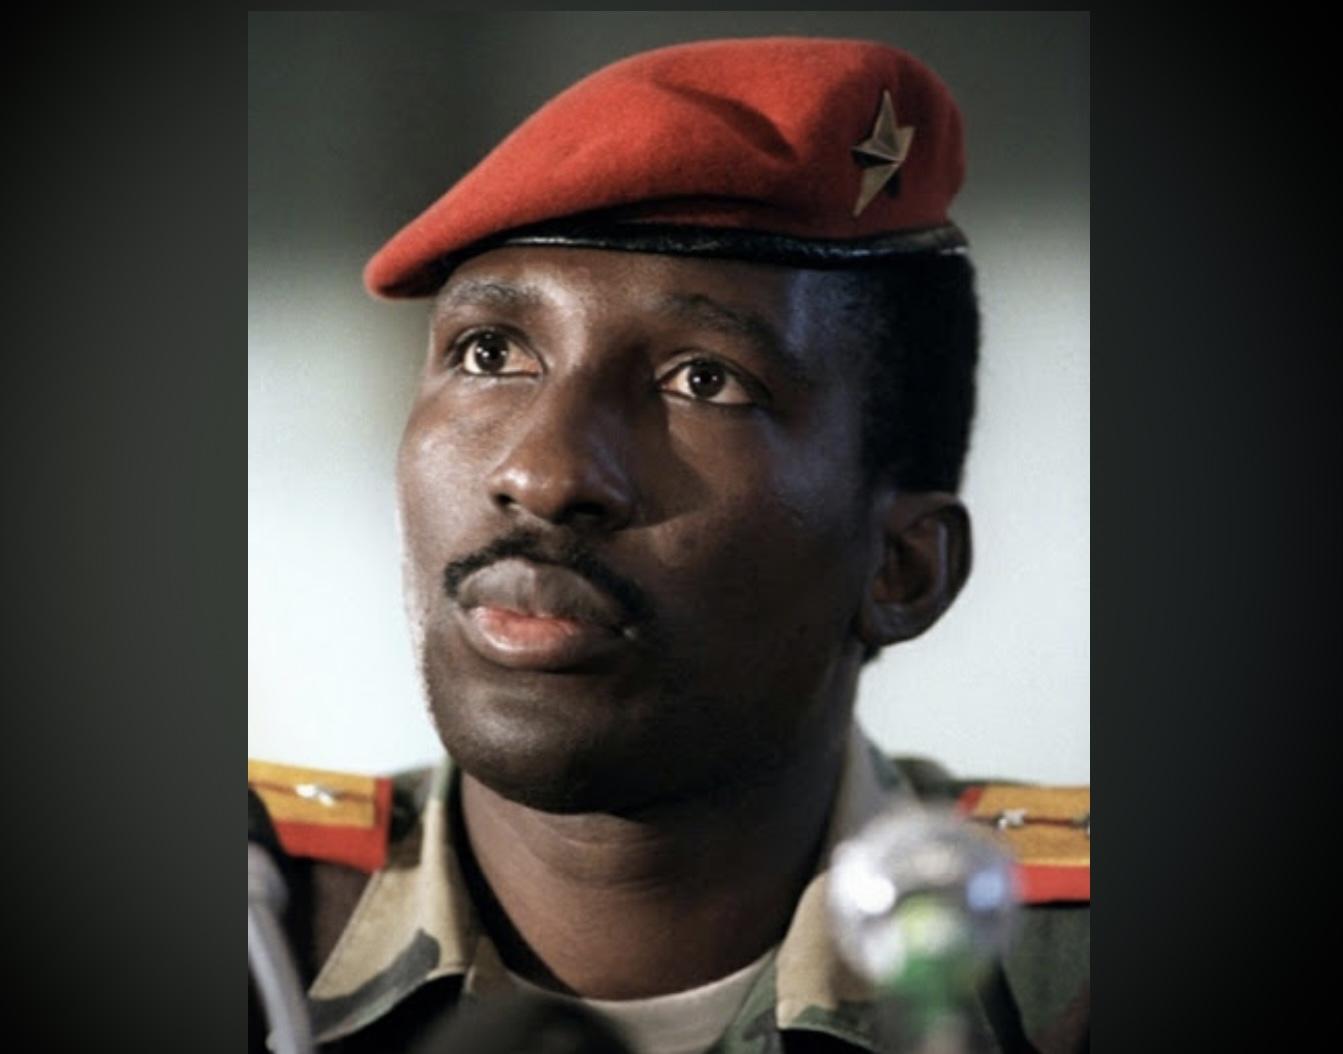 Burkina Faso: Thomas Sankara, The African Che Guevara